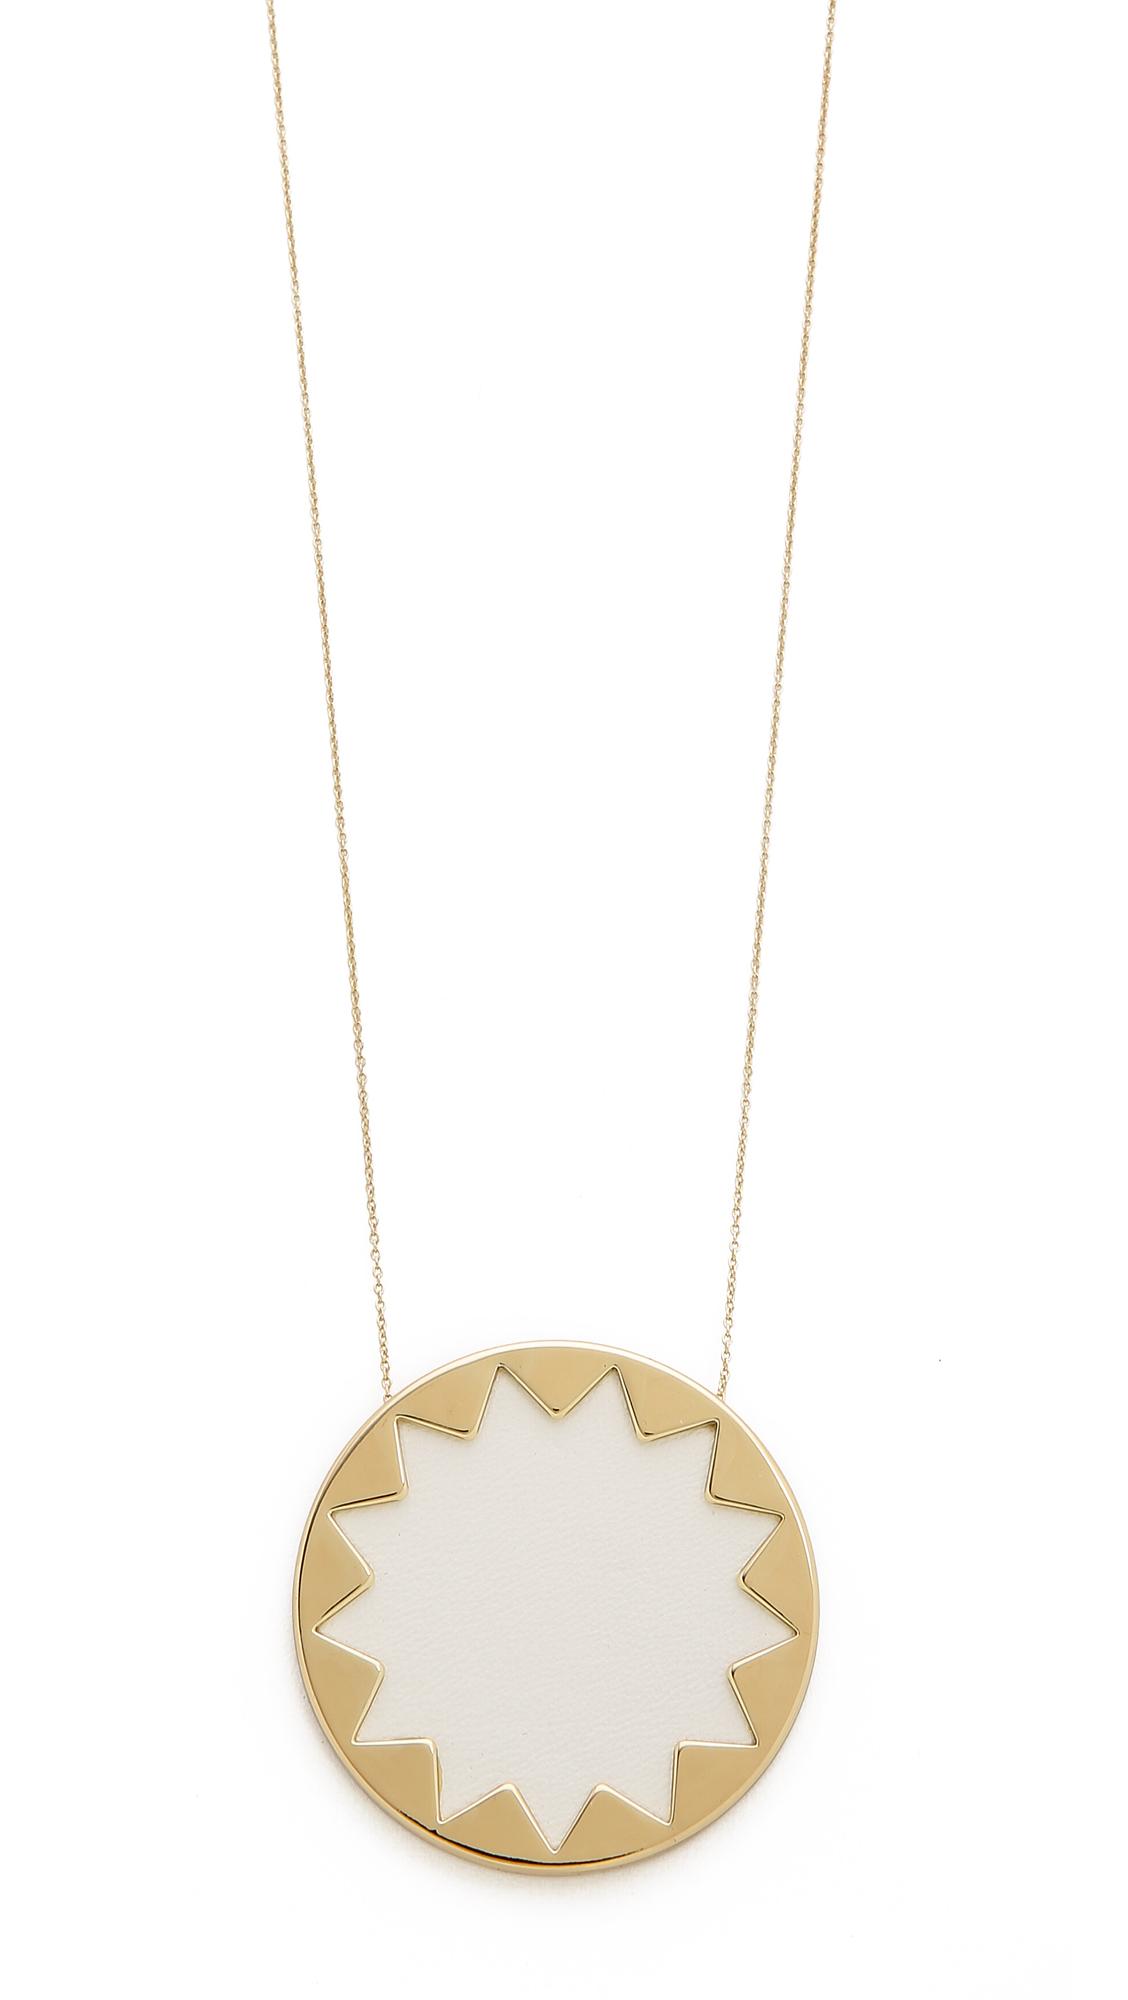 lyst house of harlow 1960 sunburst pendant necklace in white